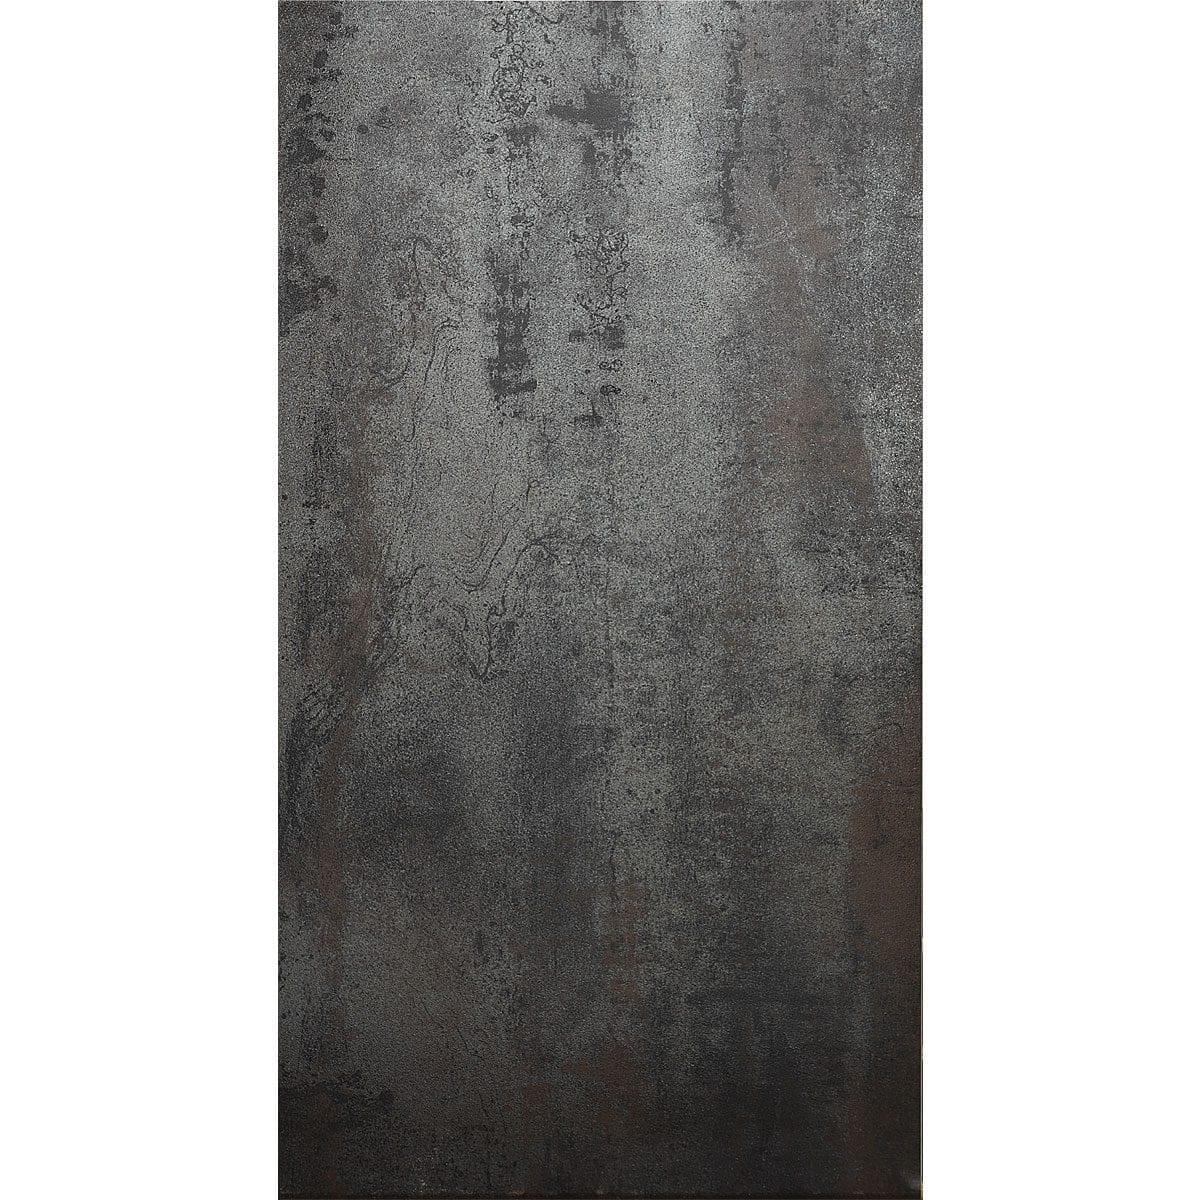 METALLIC SILVER T10234 P1